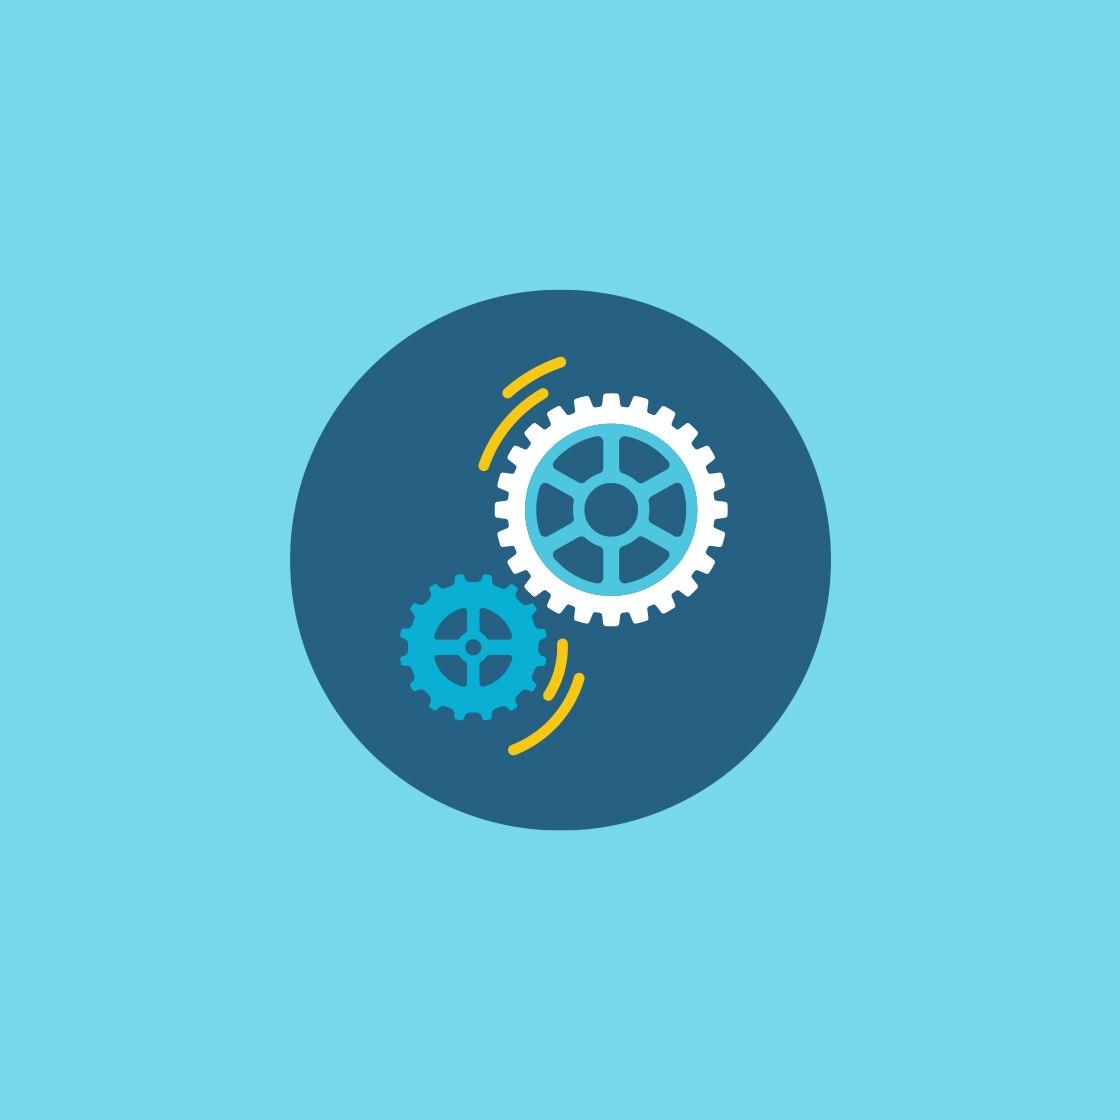 illustration of gears